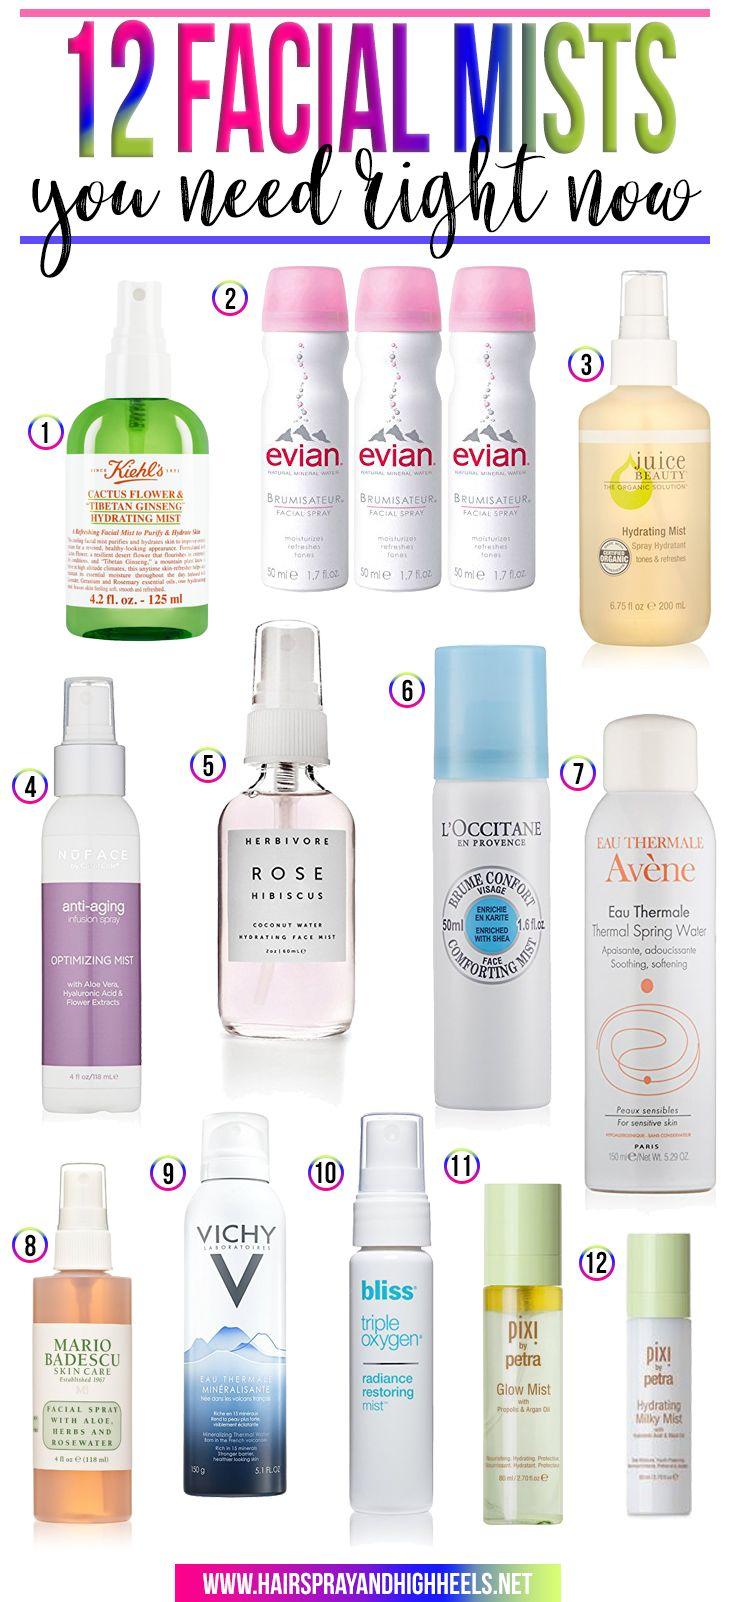 12 Facial Mists You Need Right Now - Hairspray and Highheels http://www.hairsprayandhighheels.net/2017/05/12-facial-mists-need-right-now/